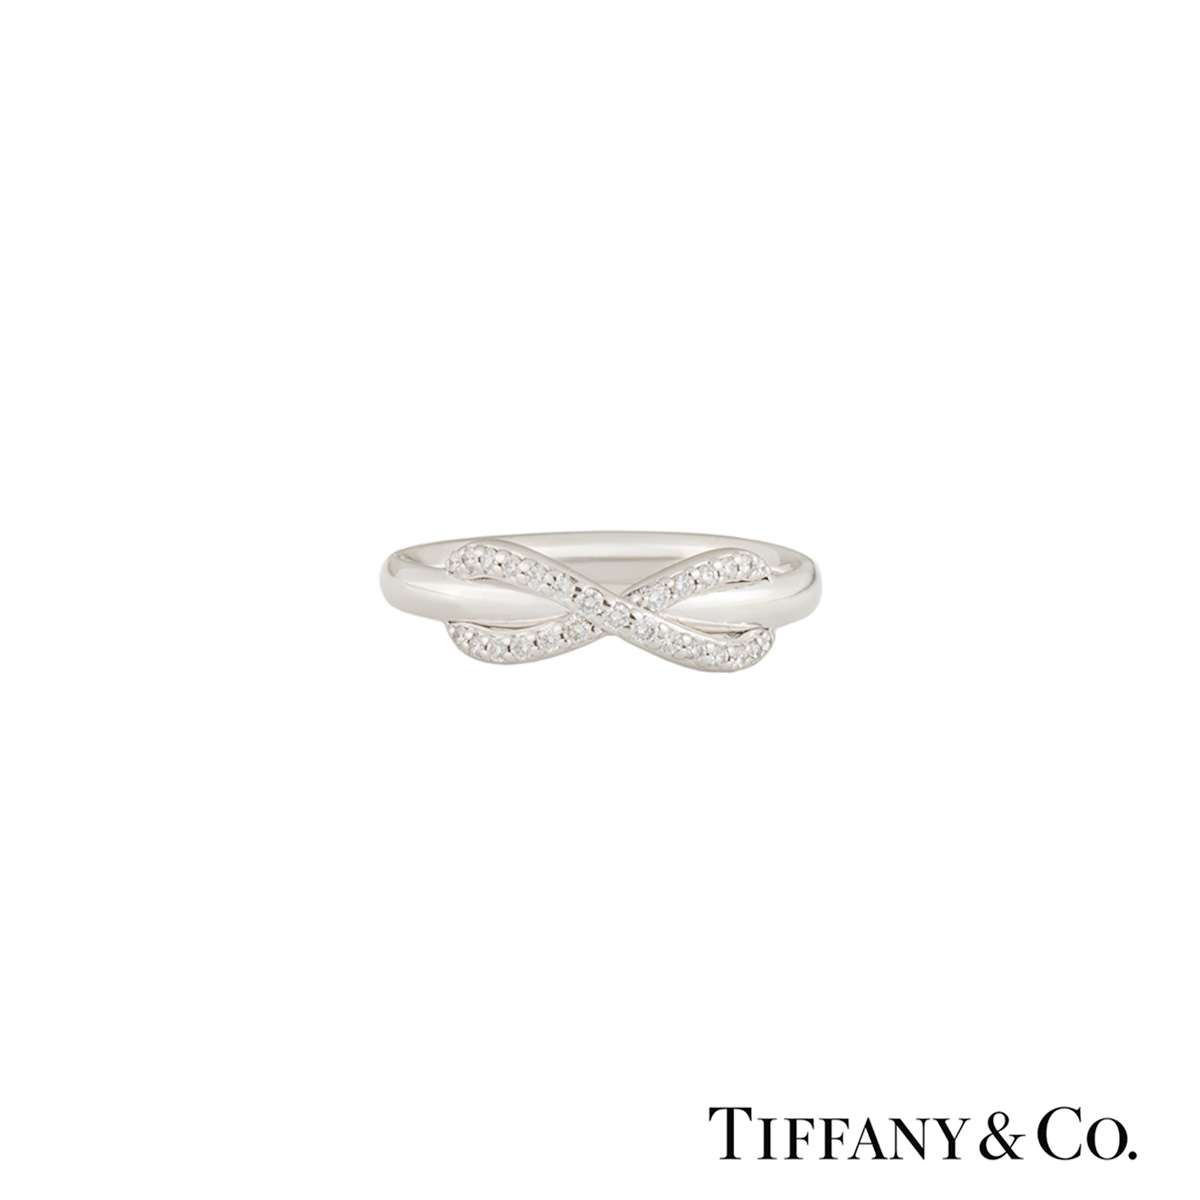 Tiffany & Co. White Gold Diamond Infinity Ring 0.13ct F/VS